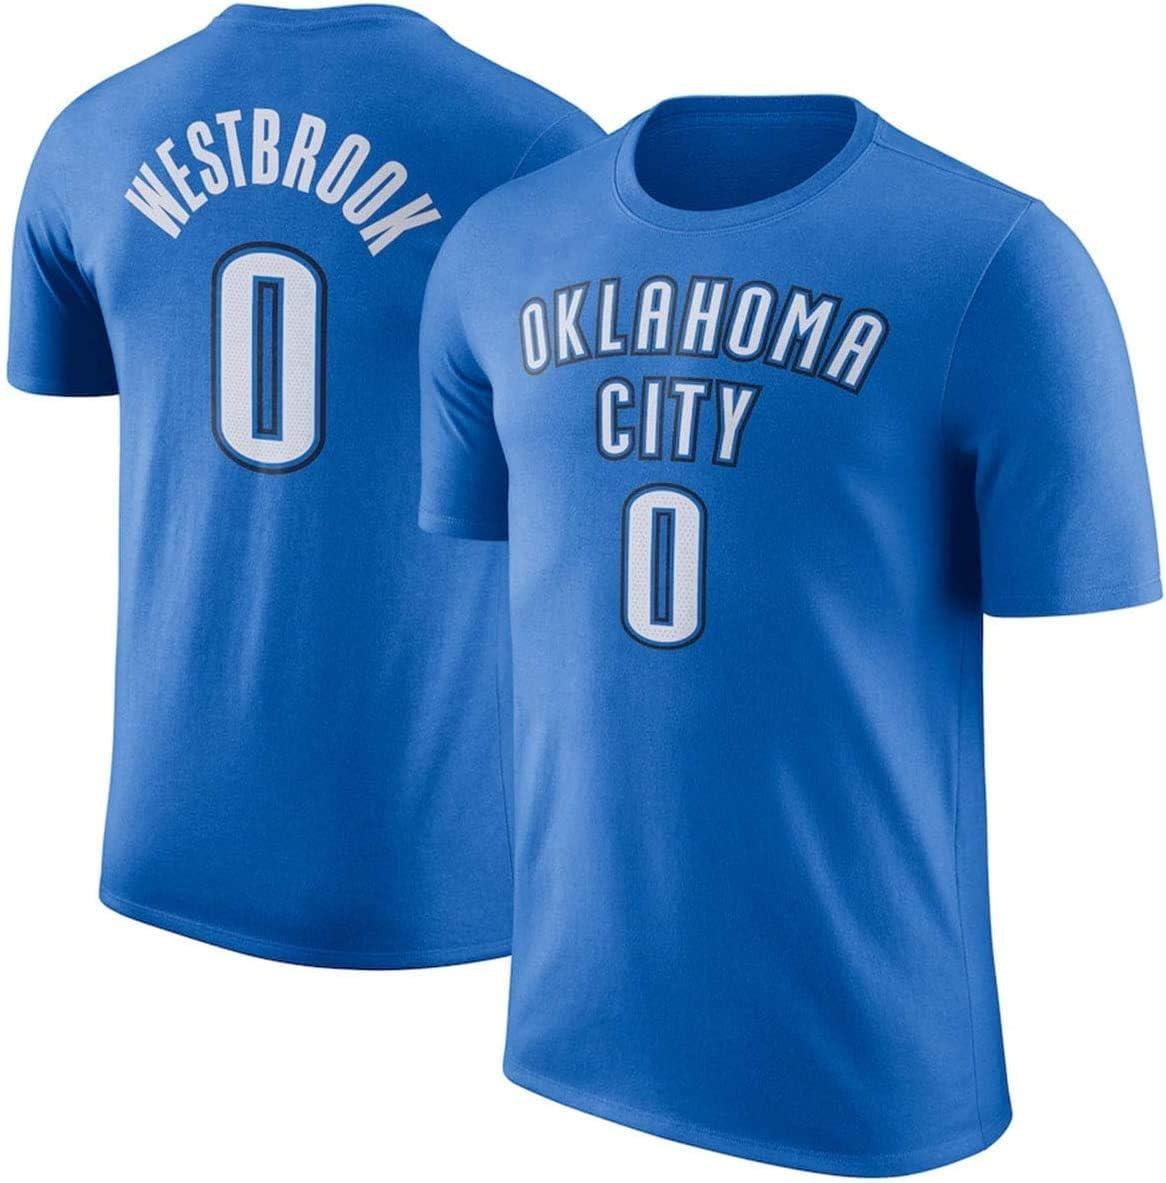 Camiseta de Verano Camiseta for hombre del trueno # 0 ...